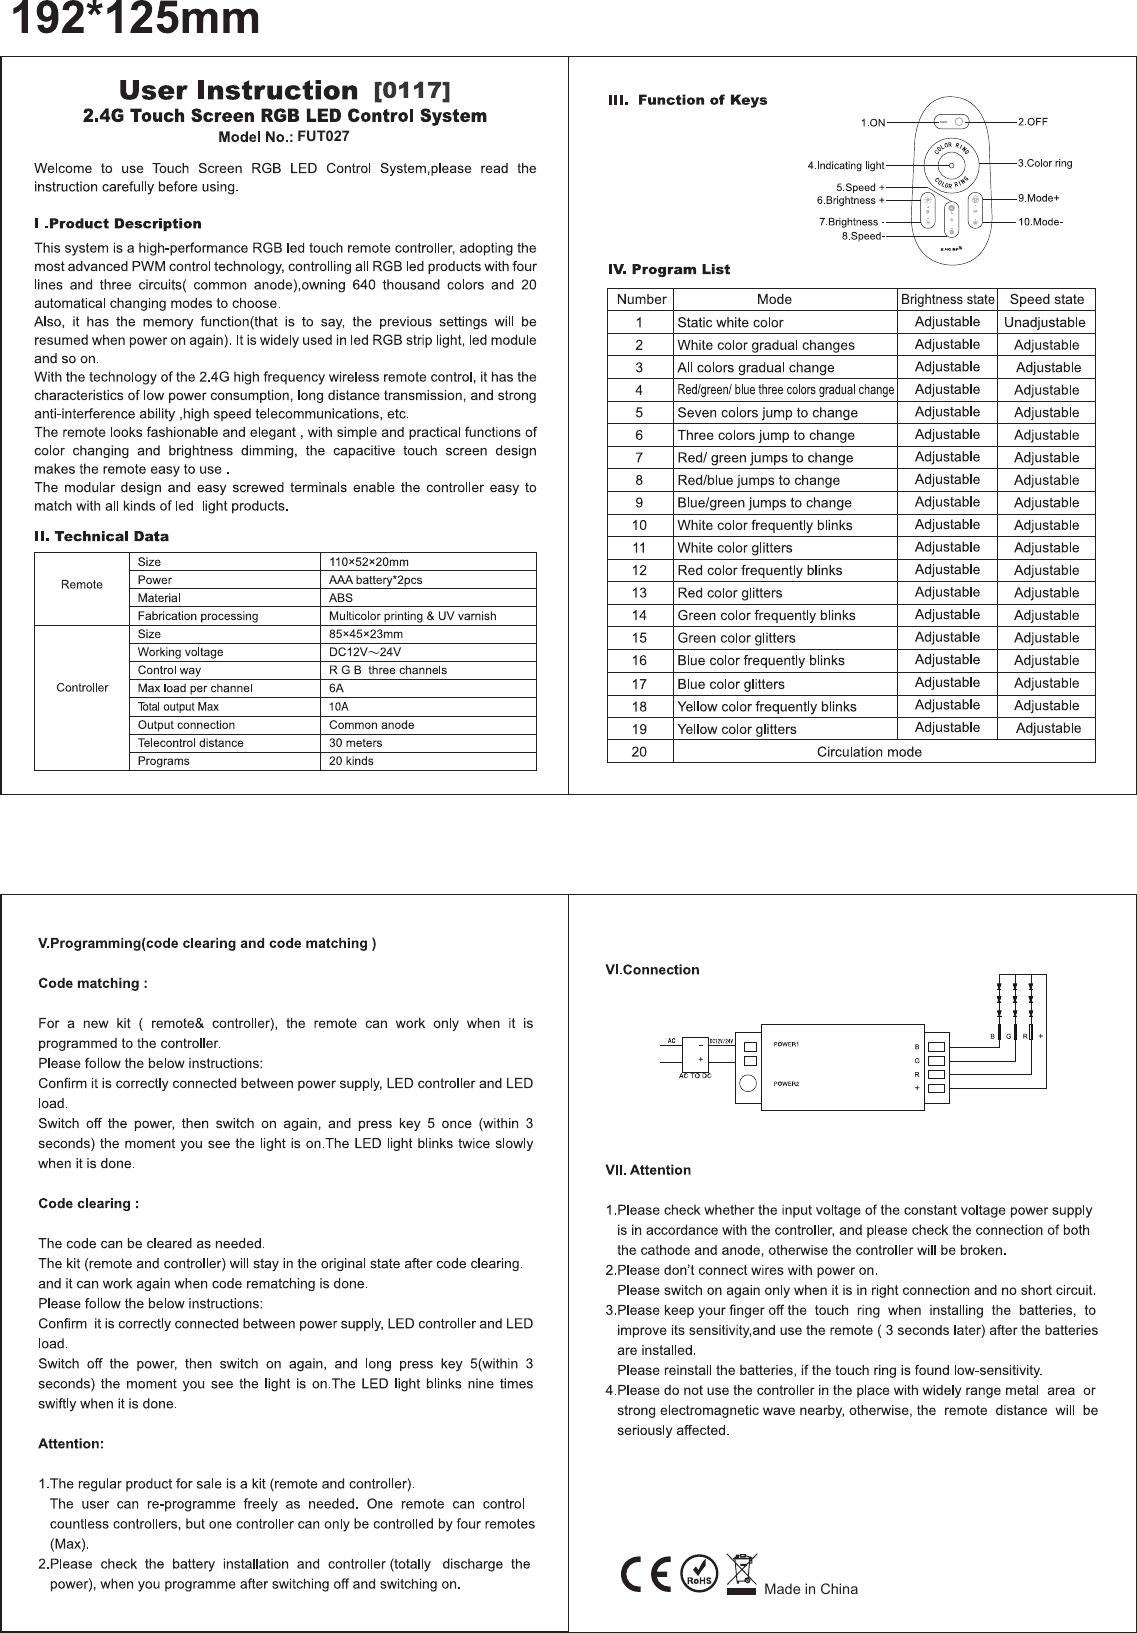 Hebei Pengyuan Optoelectronics FUT027 LED Strip Controller